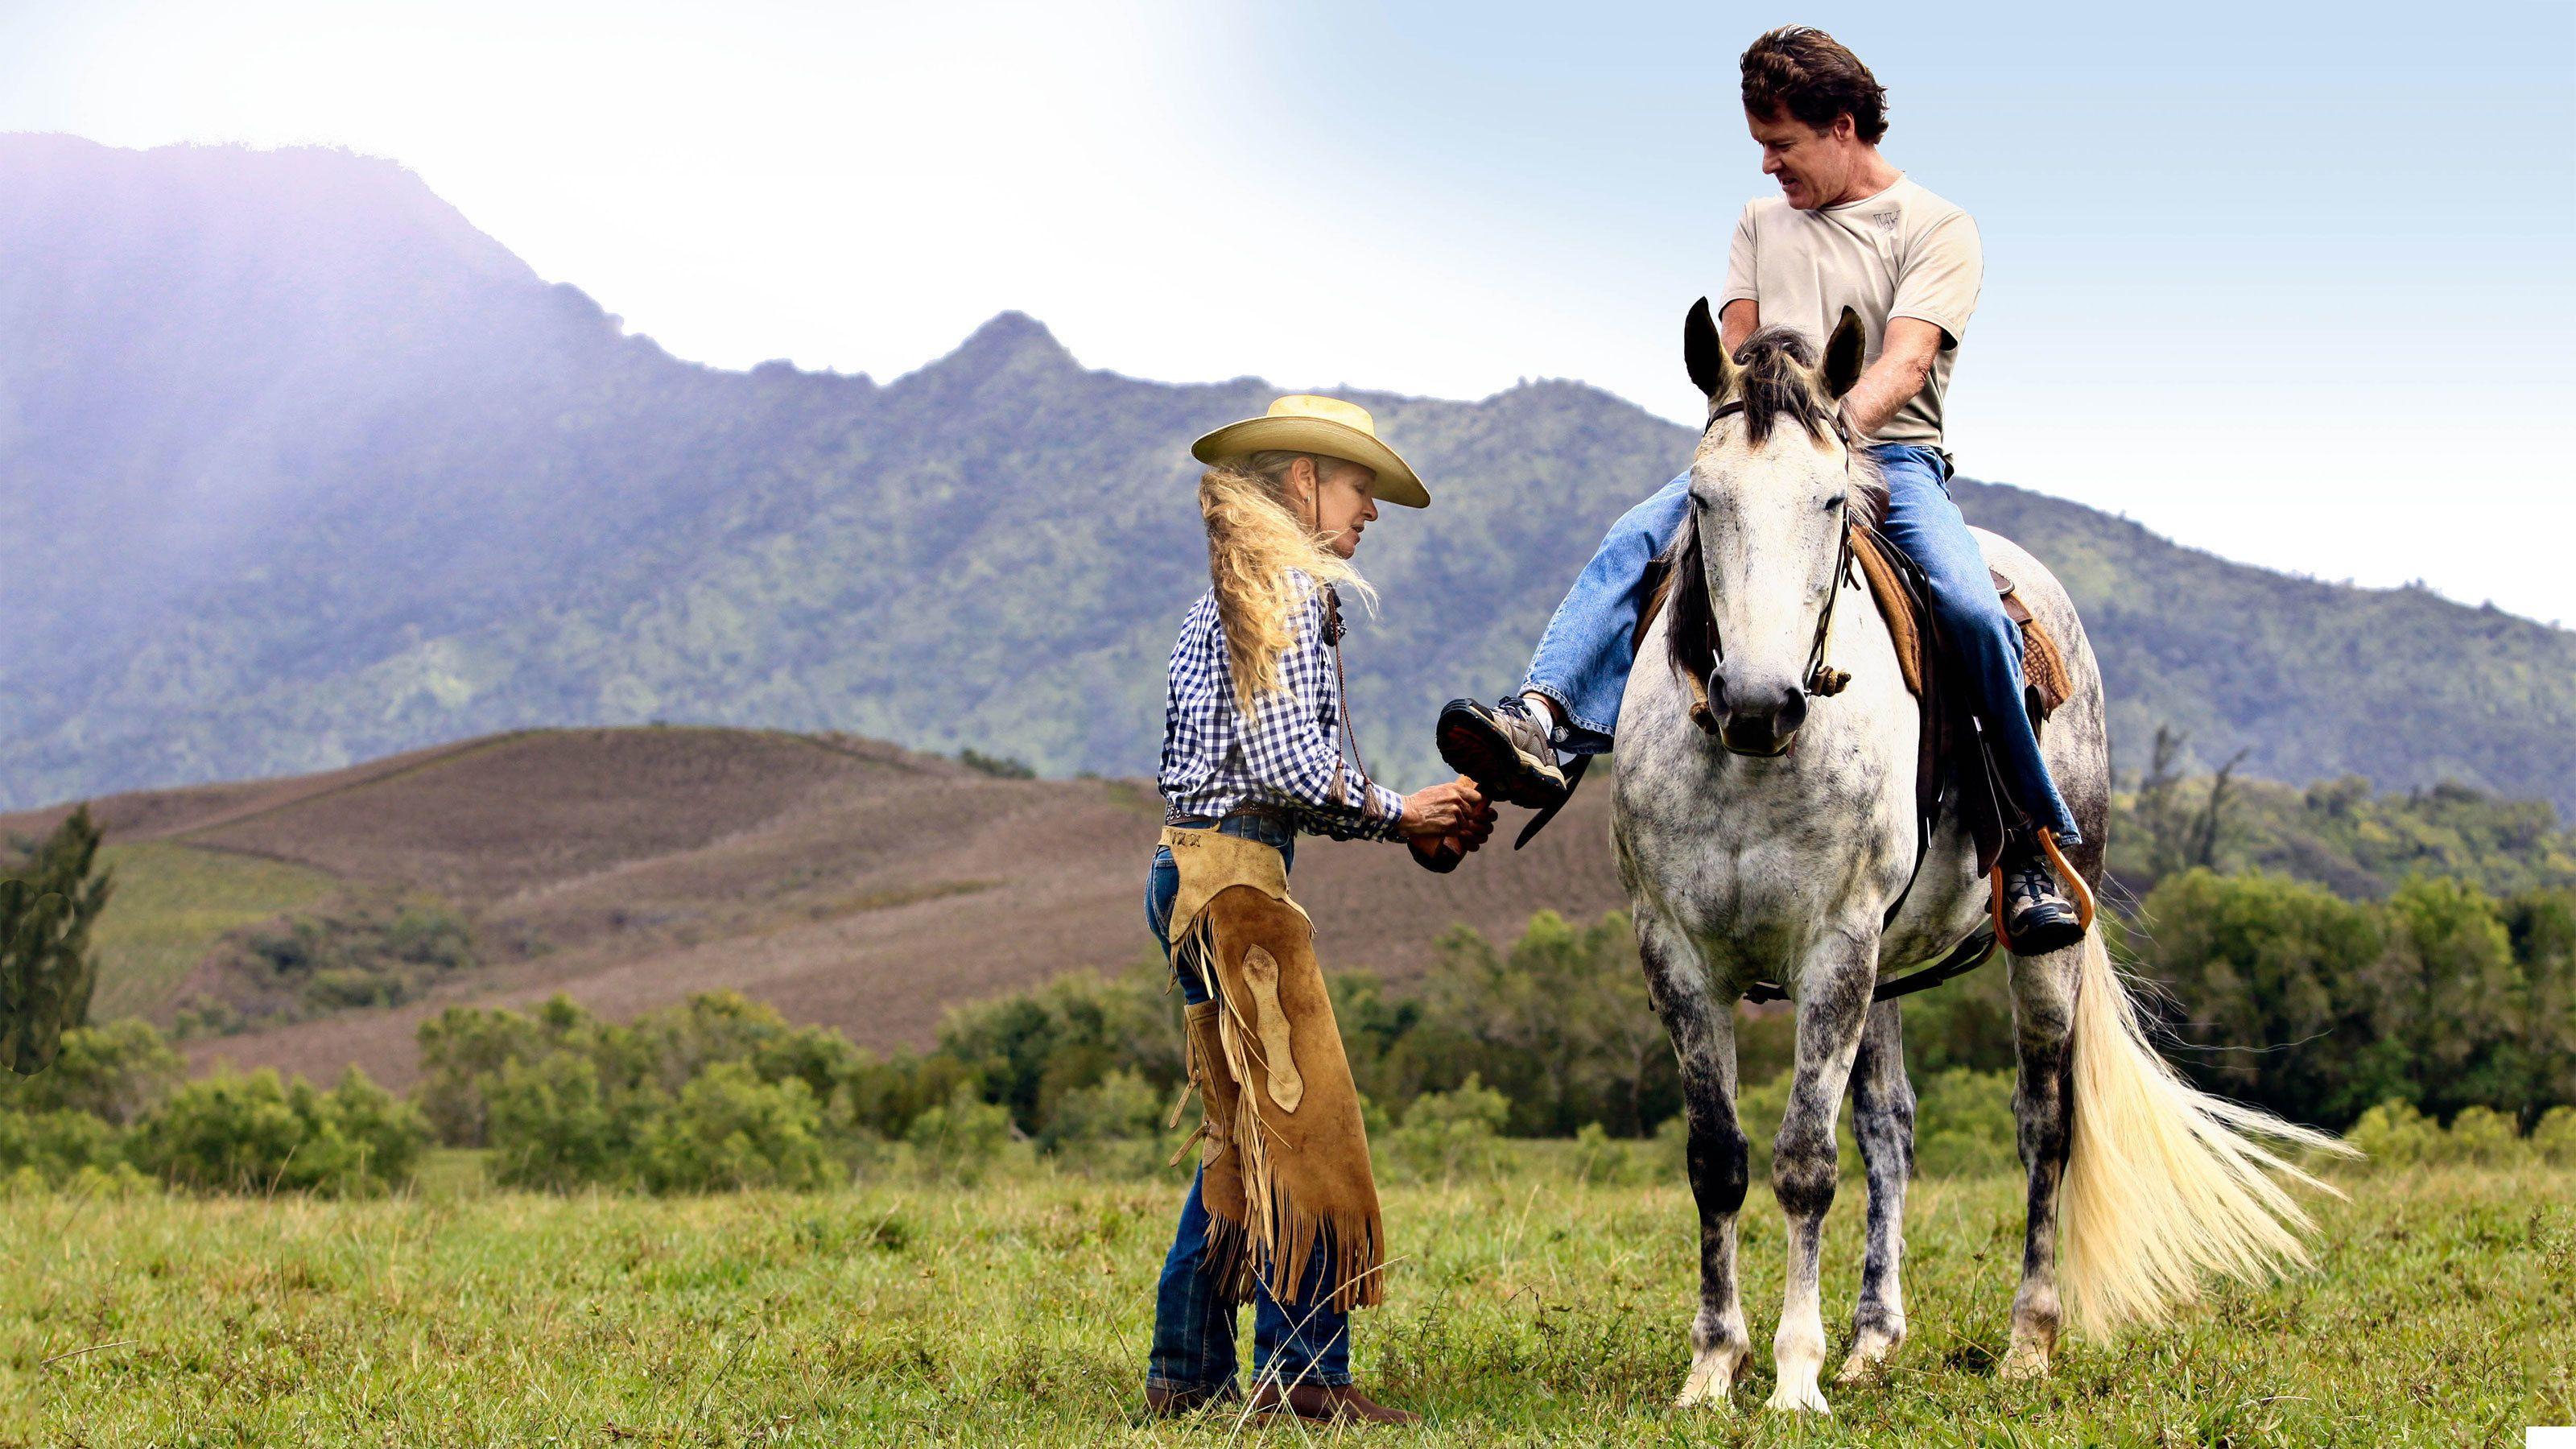 woman adjusting stirrups for man on horse in Kauai